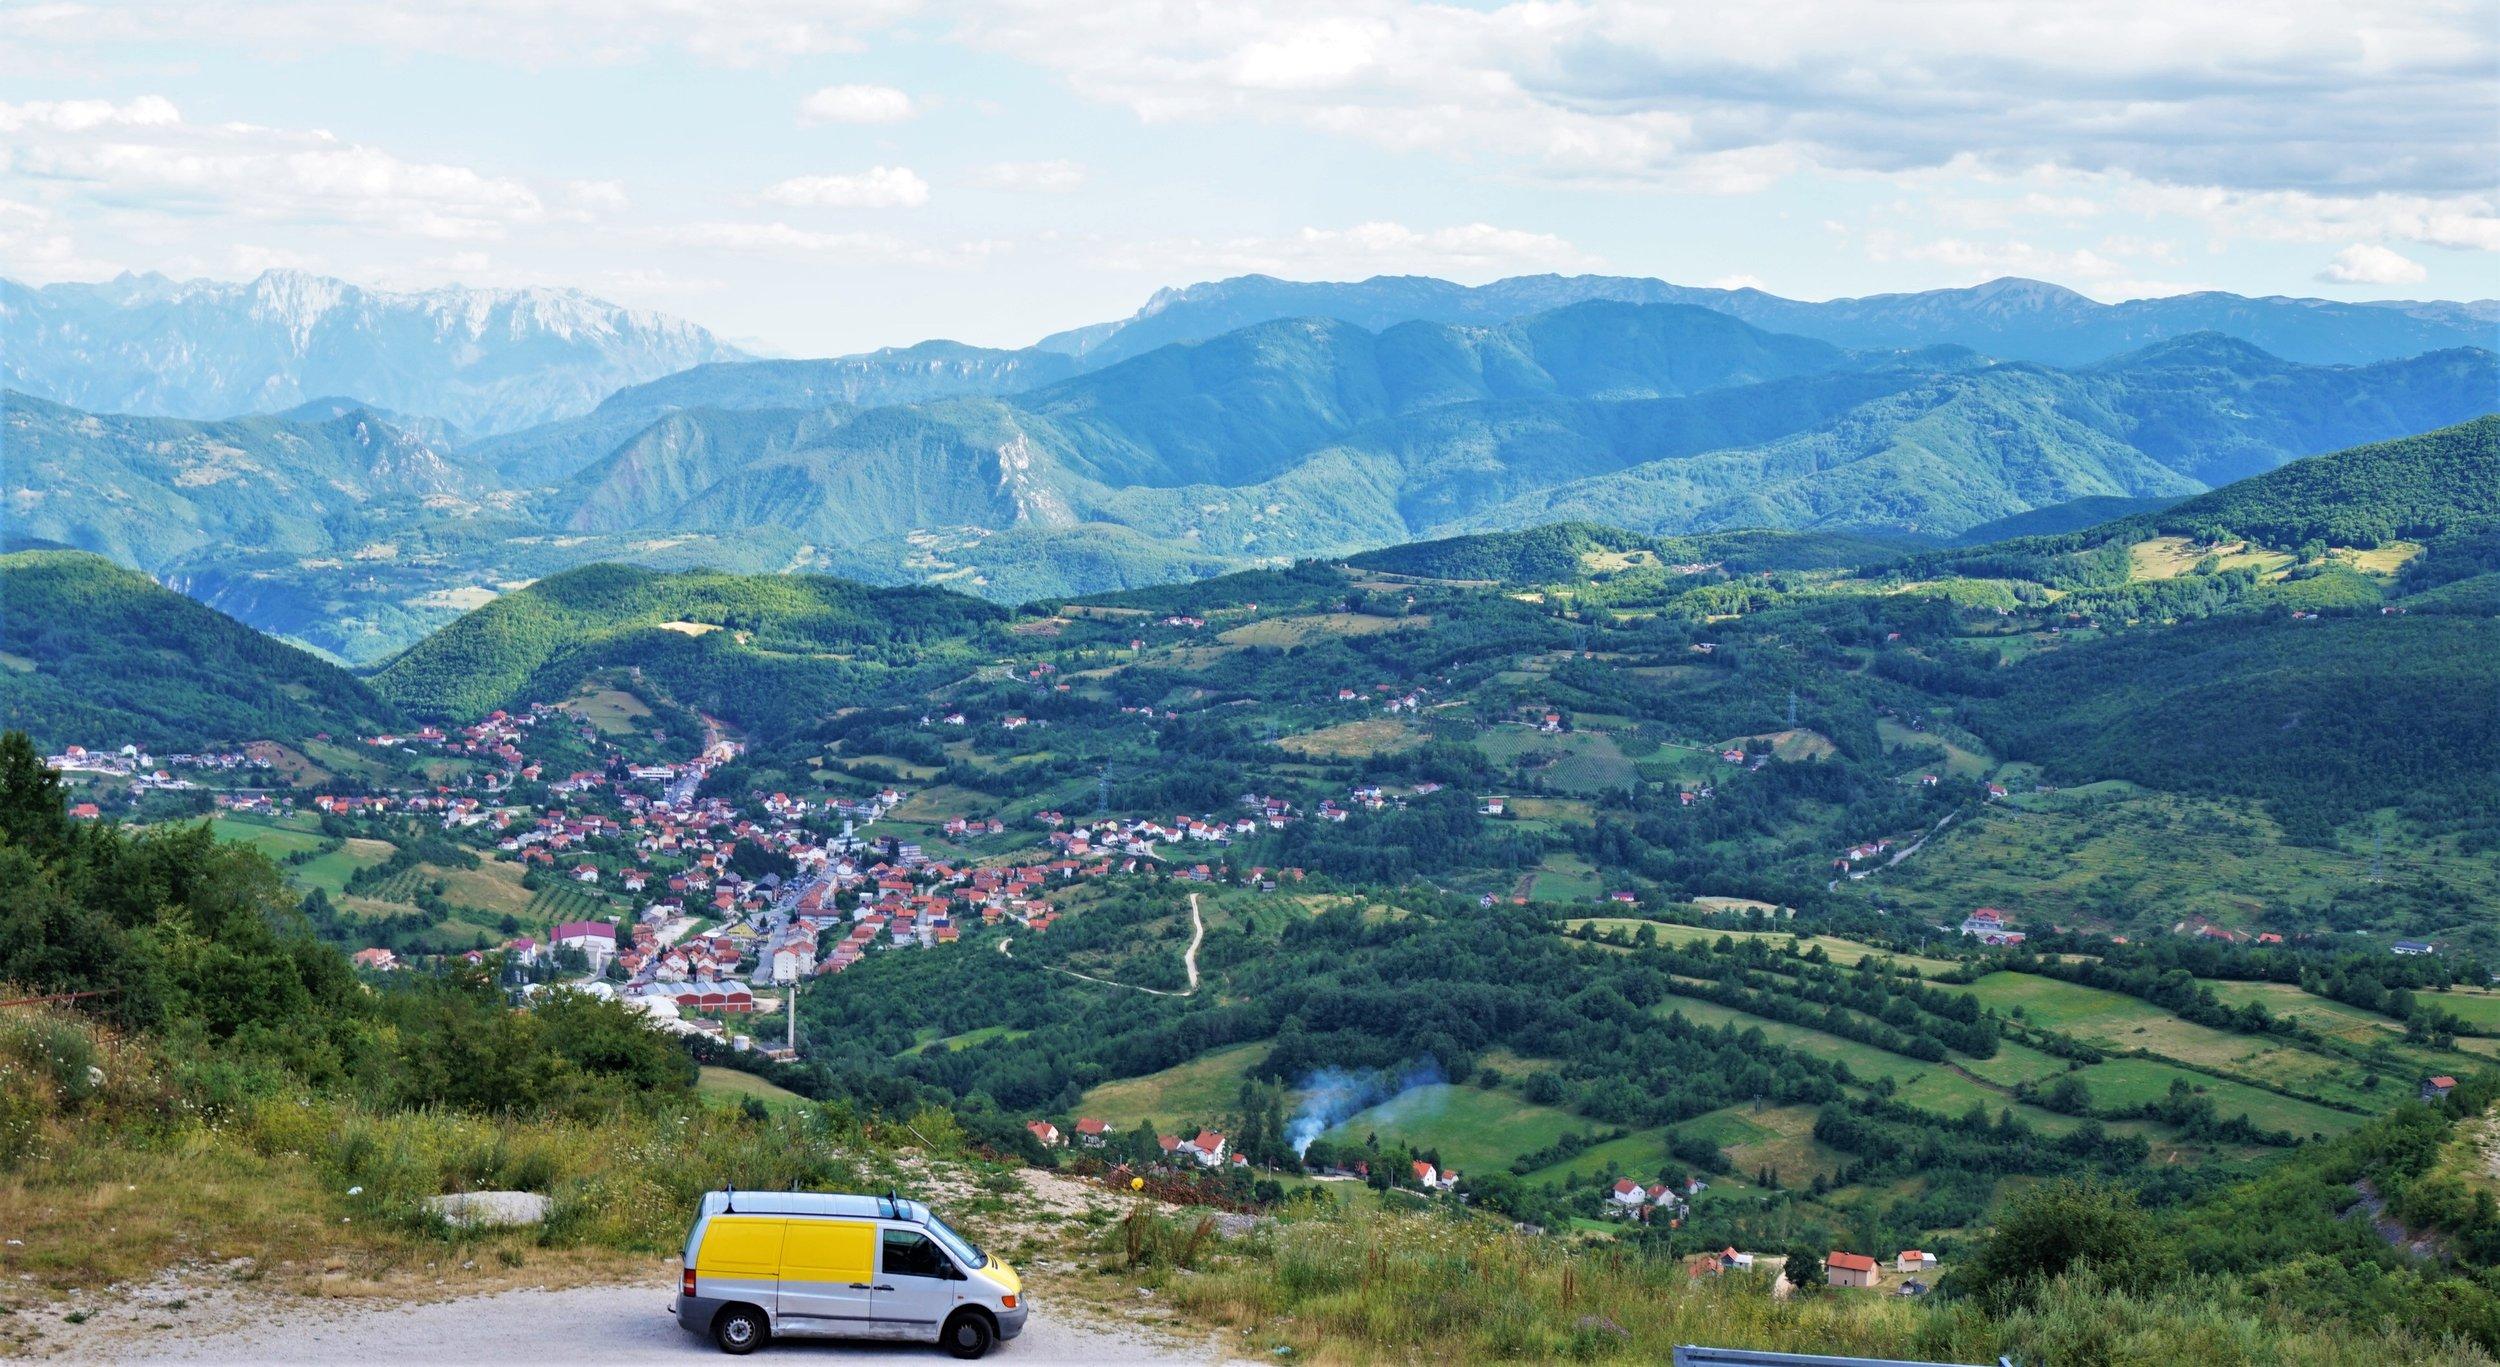 Views in Bosnia, the Balkans, a great place for a road trip #balkans #roadtrip #planning